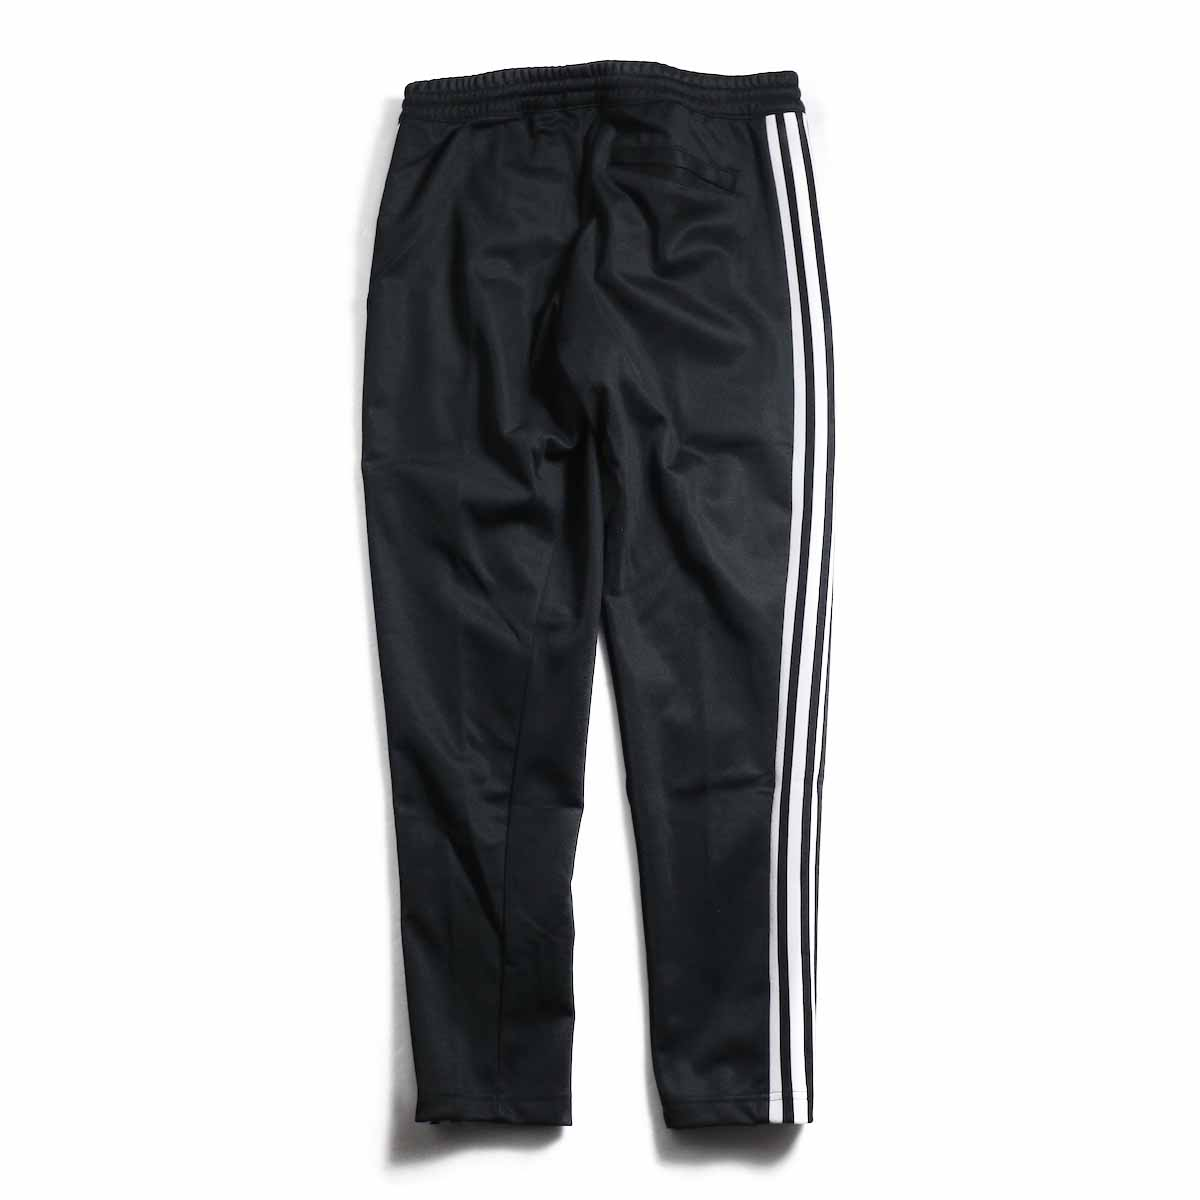 adidas originals / Beckenbauer Track Pants -Black 背面